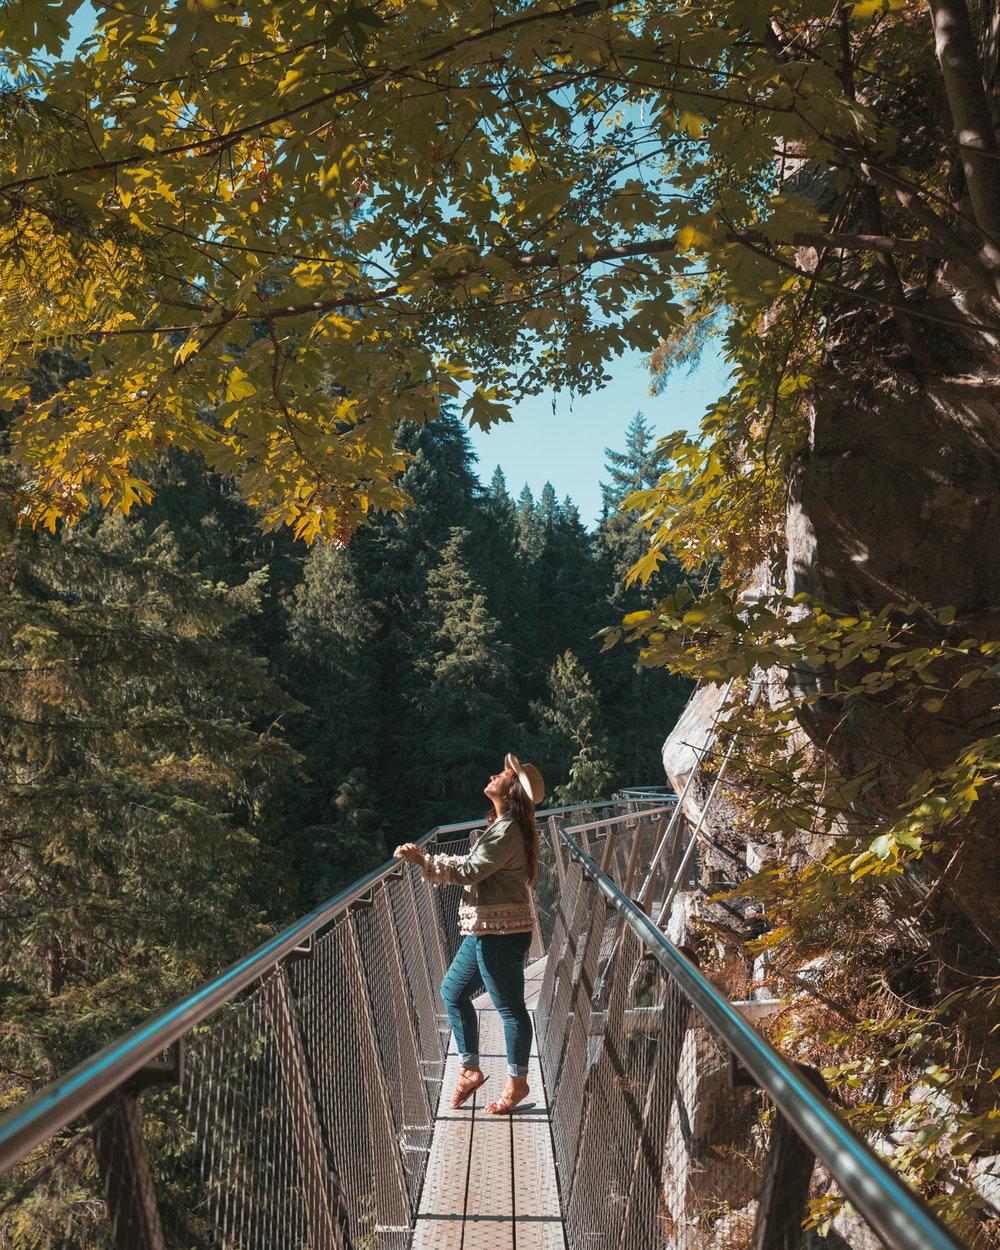 CLIFFWALK at Capilano Suspension Bridge Park // The Quick Guide to Visiting Vancouver, BC #readysetjetset